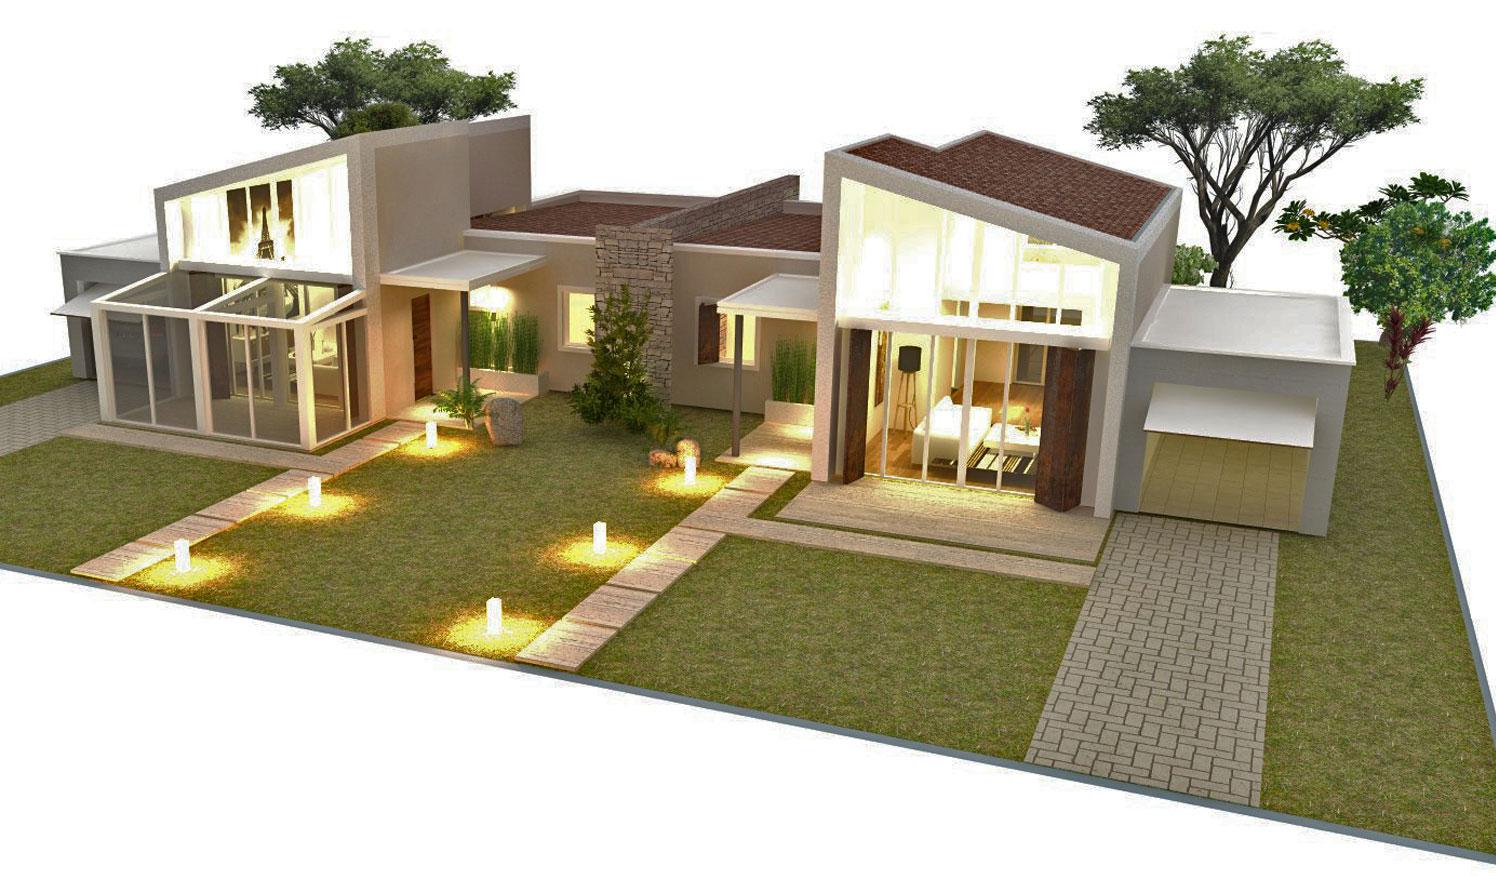 case in vendita a Grosseto bi familiari-prospettiva